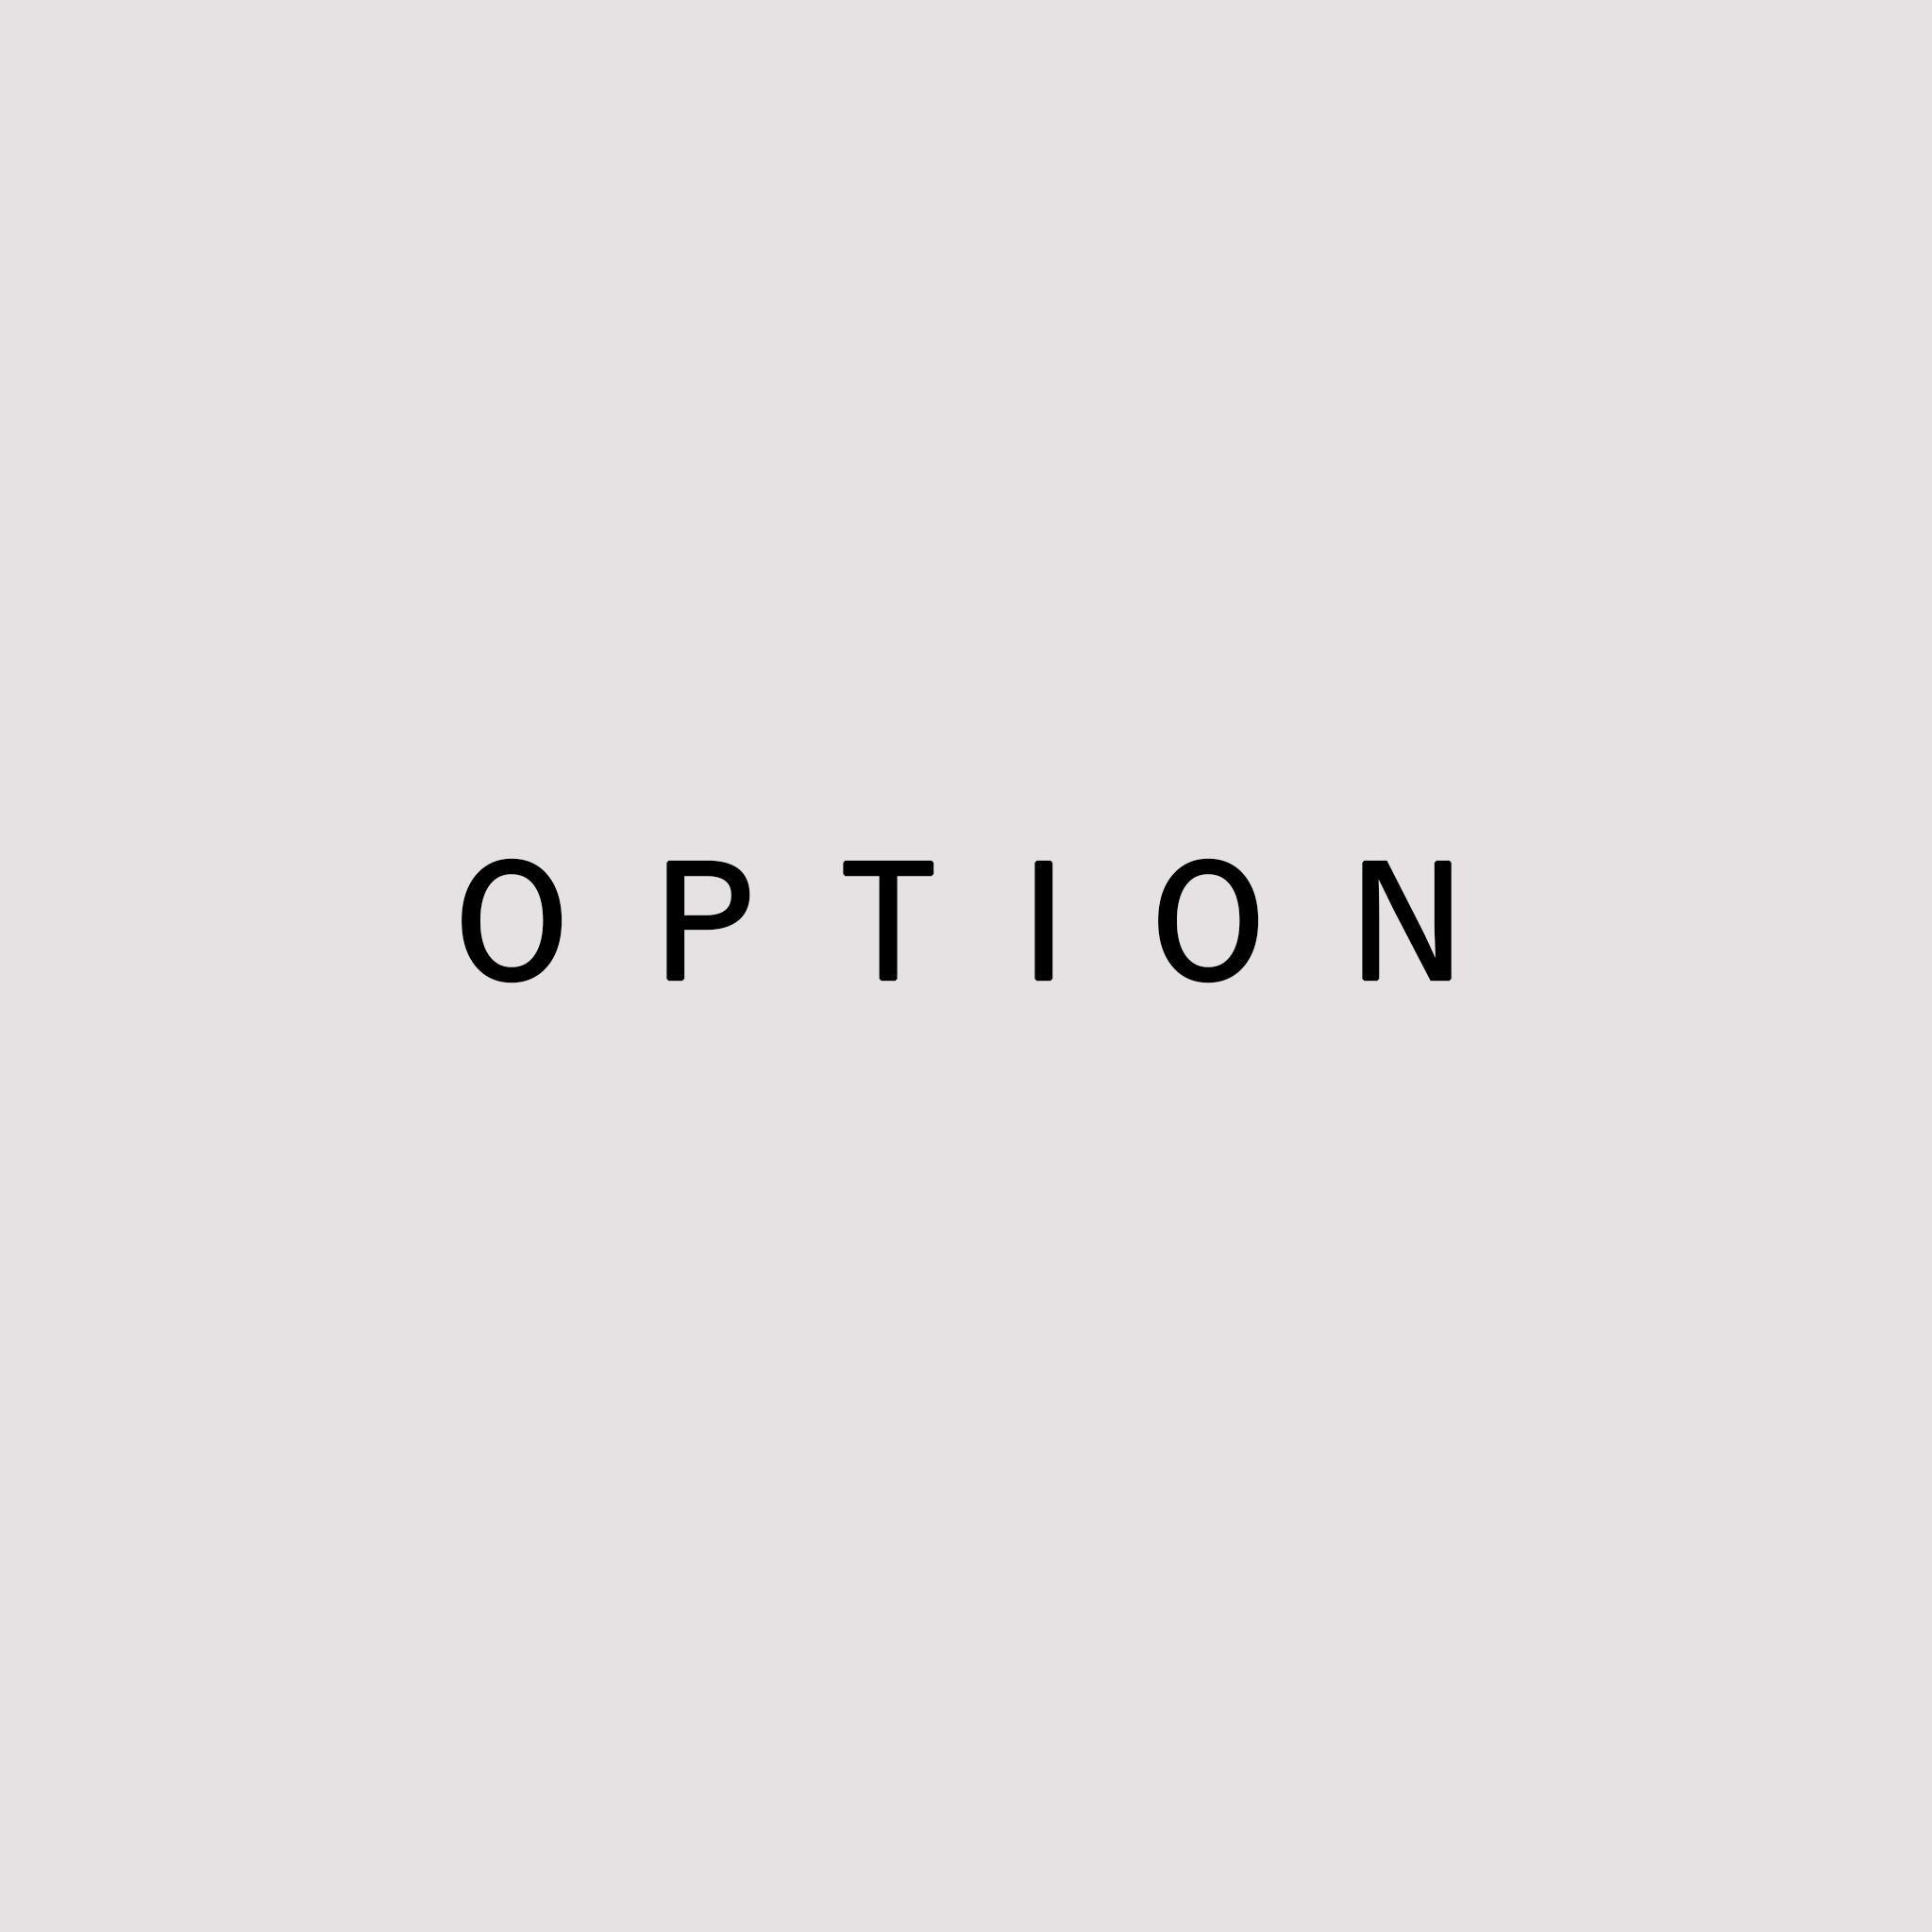 OPTION 《 3,300 yen 》